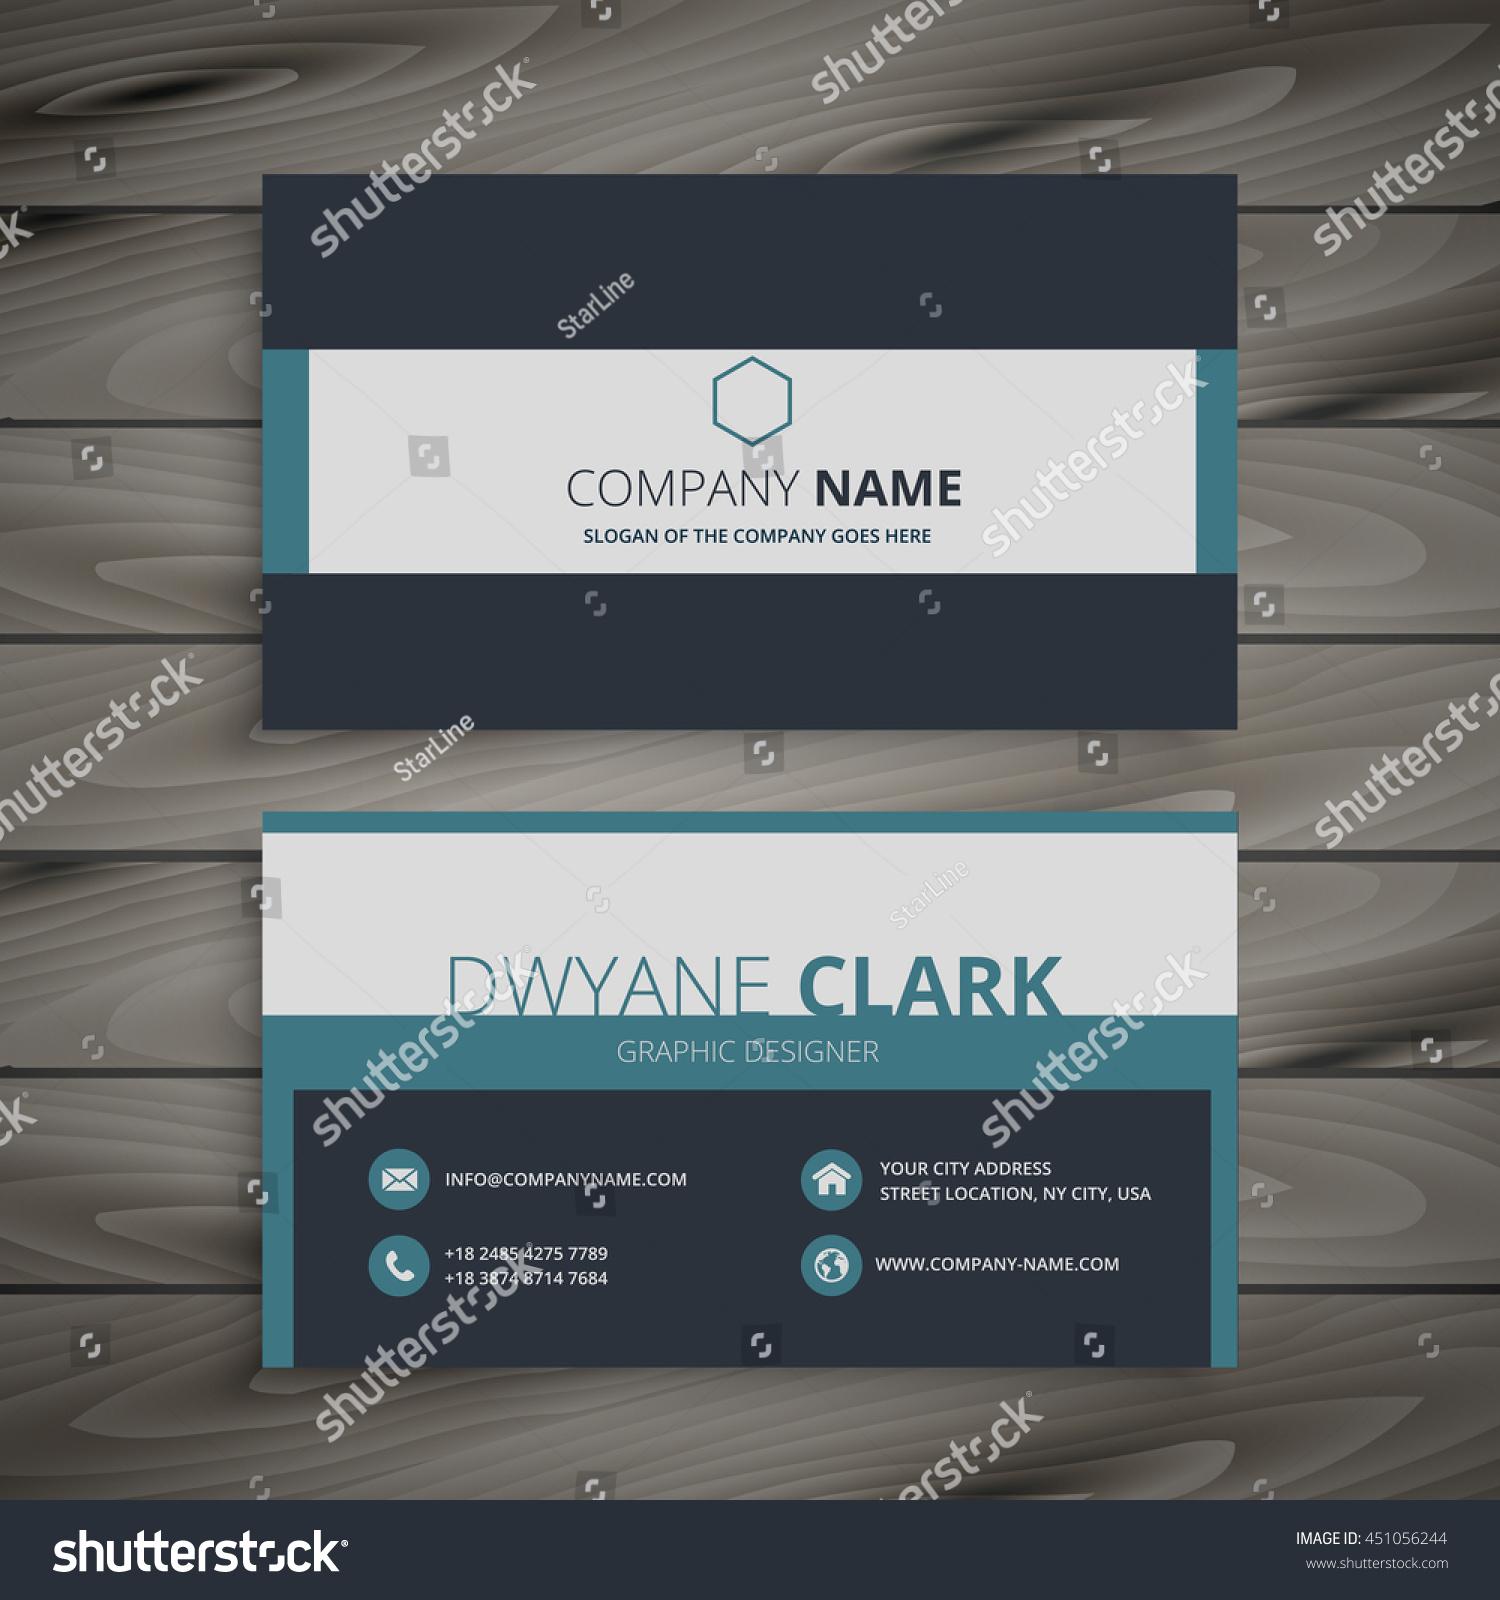 Elegant Business Card Template Stock Vector 451056244 - Shutterstock